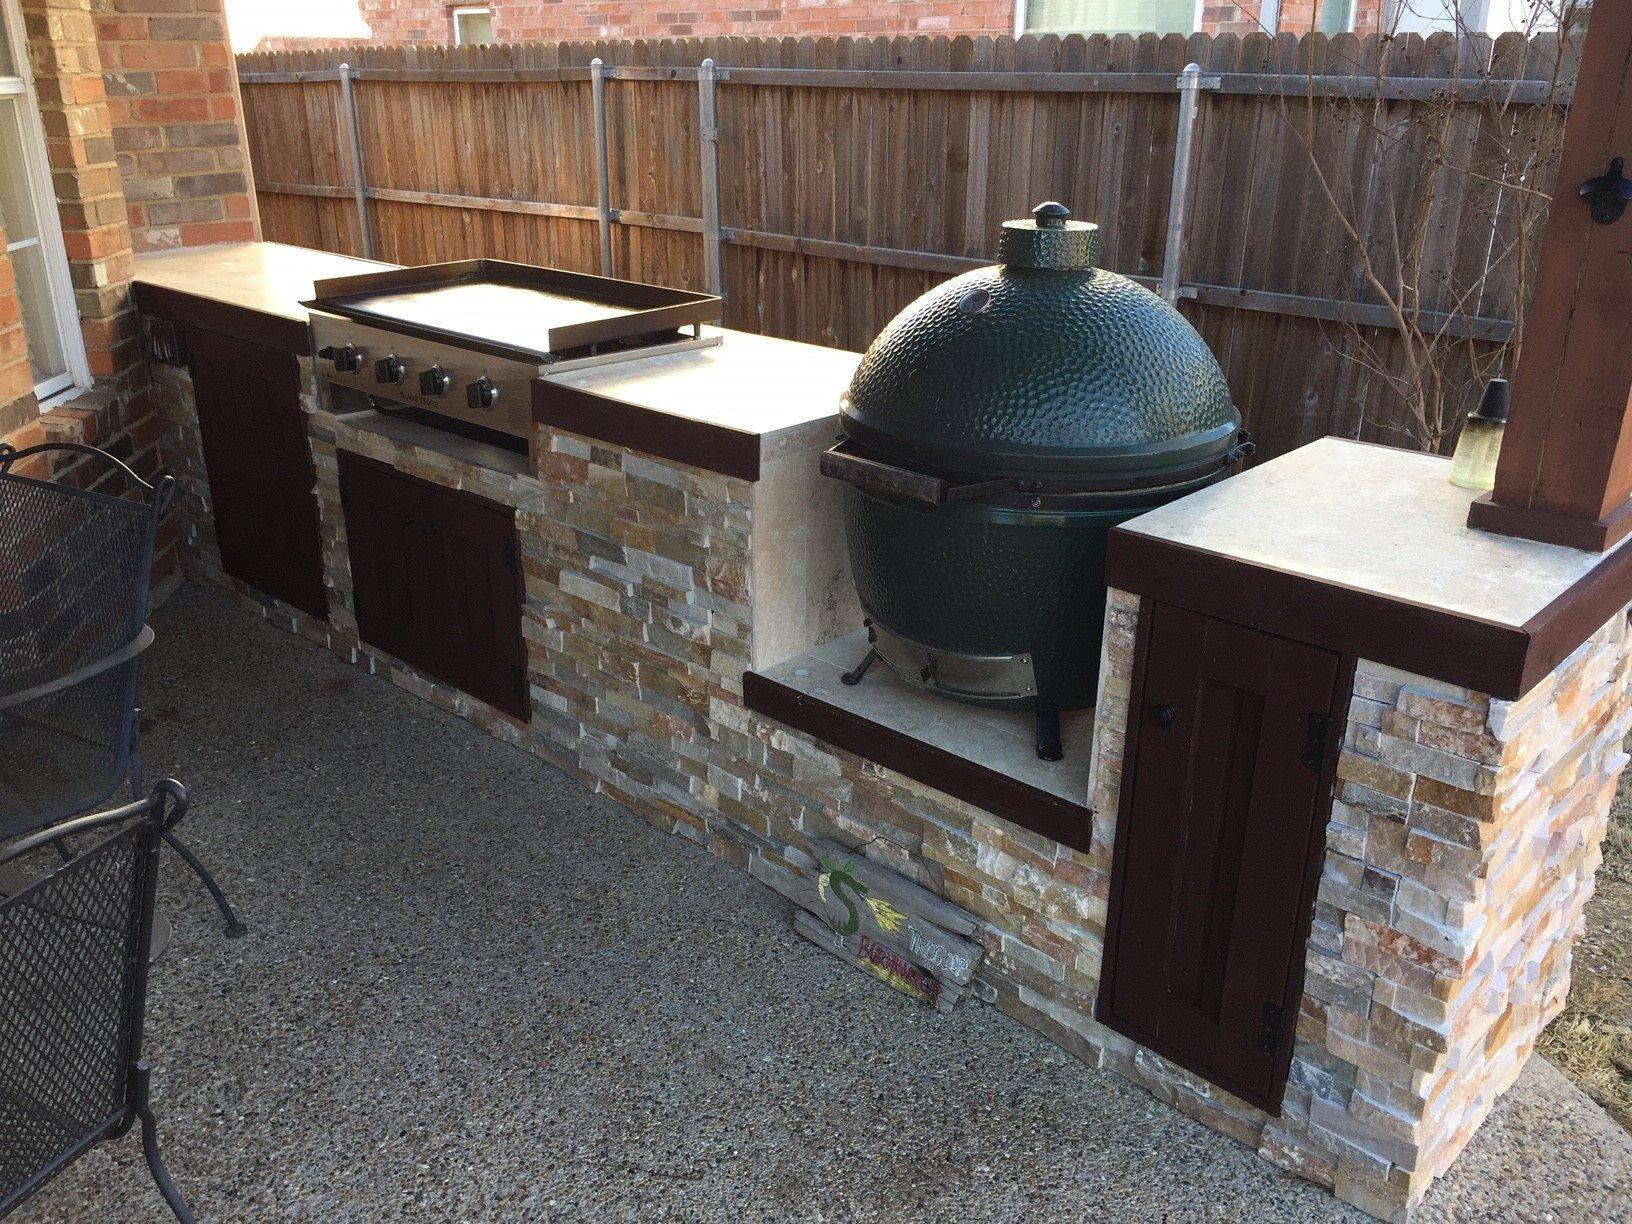 Outdoor Kitchen With Blackstone Griddle Novocom Top